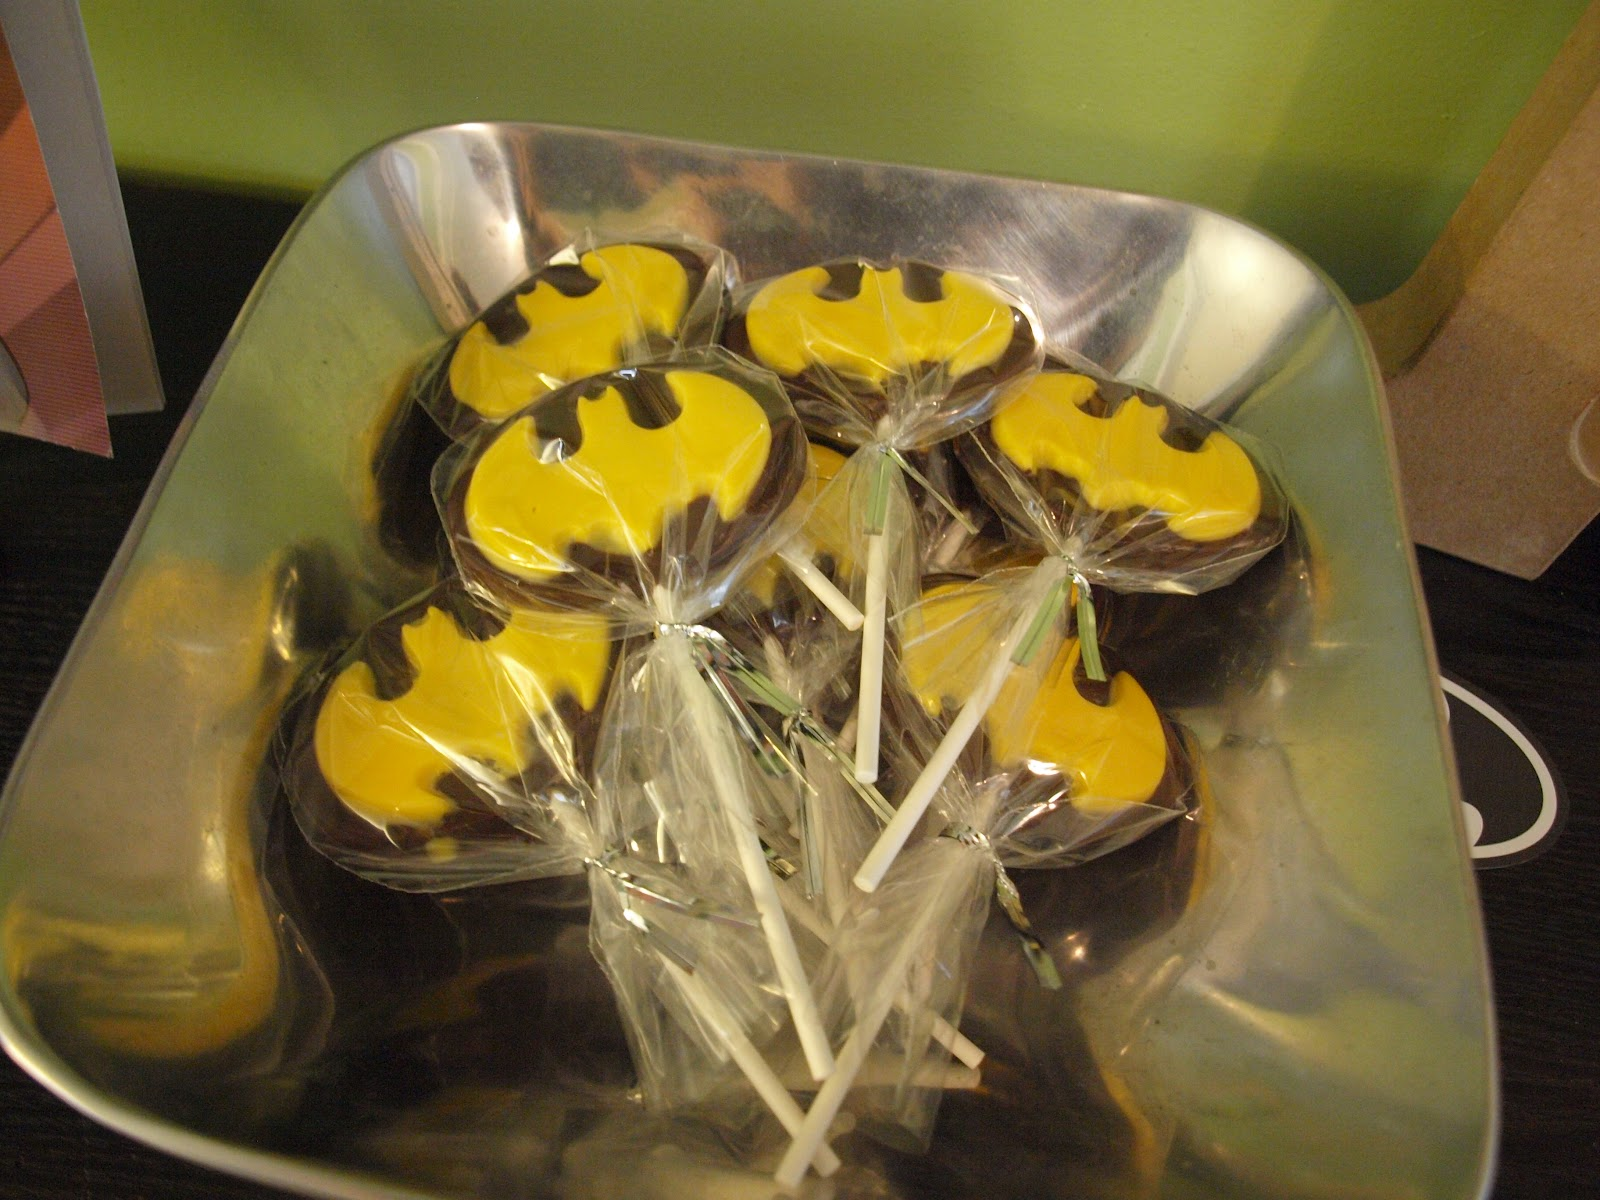 Batman Birthday Cake Mould Image Inspiration of Cake and